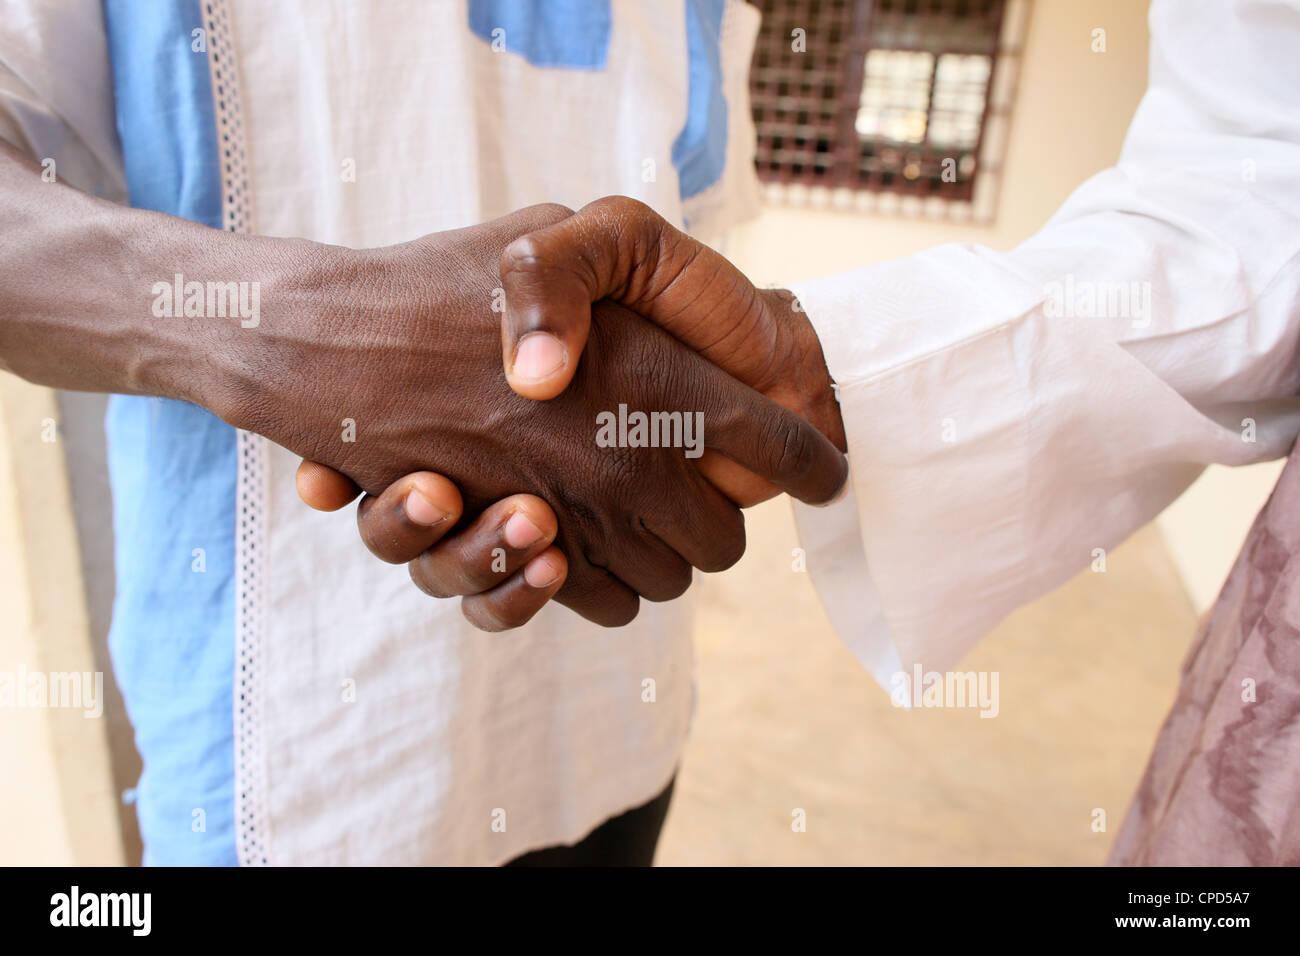 Handshake, Lome, Togo, West Africa, Africa - Stock Image